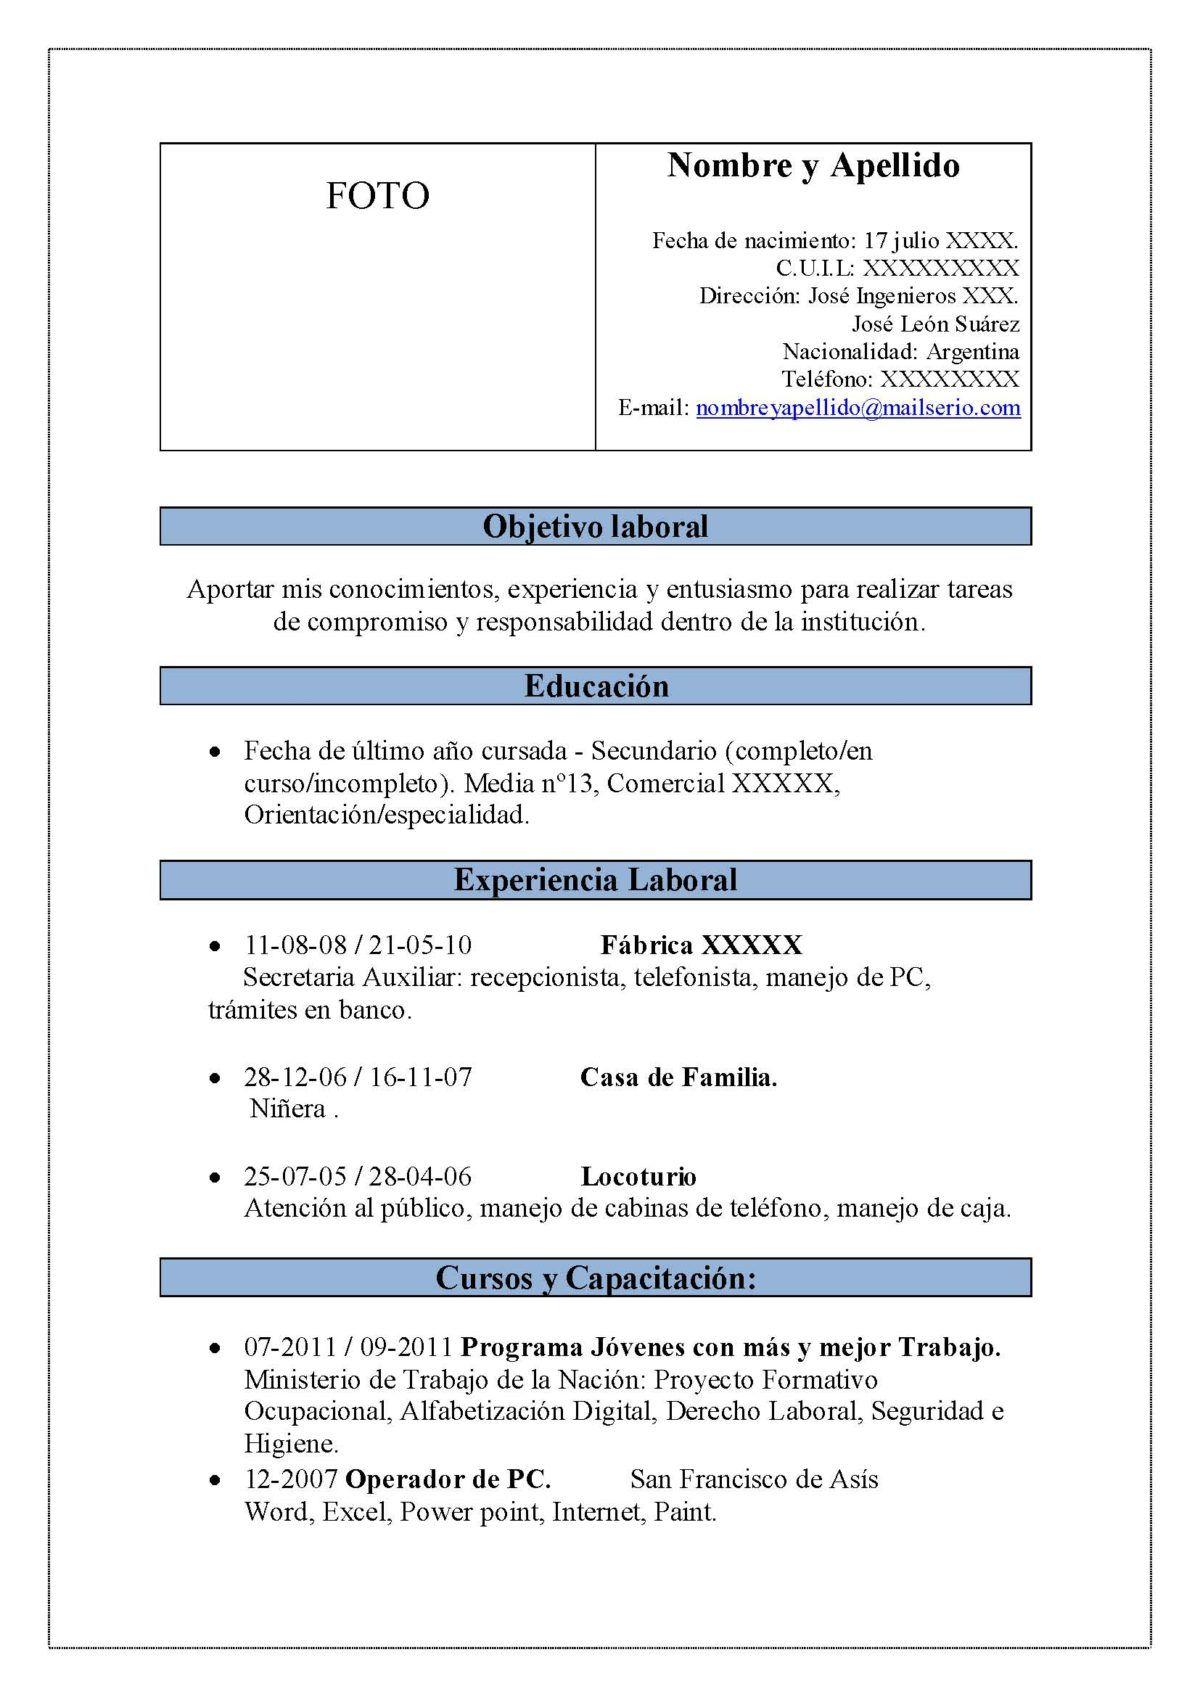 Ejemplo de curriculum vitae - Ejemplos de | punto cruz | Pinterest